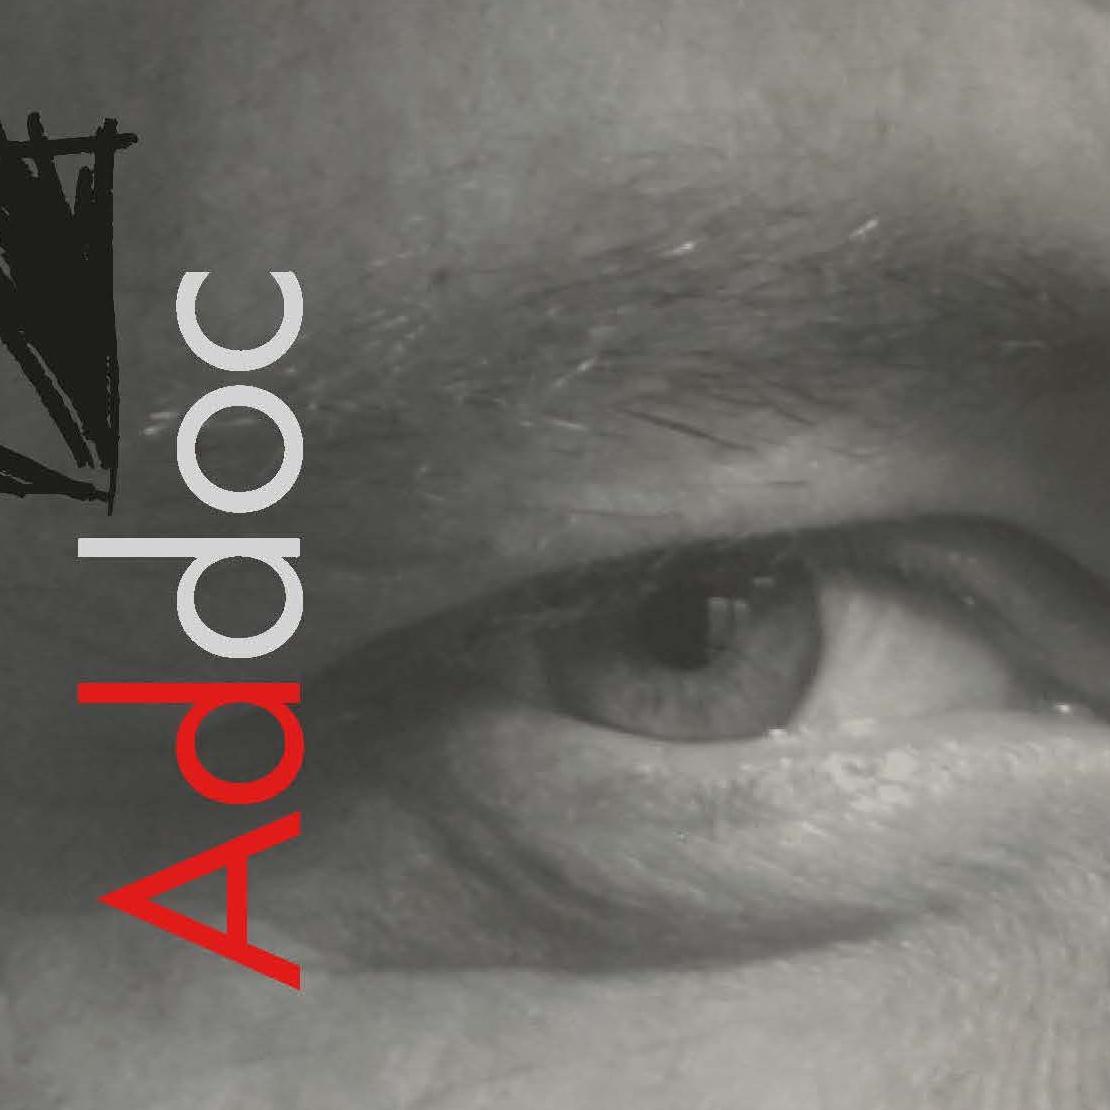 Image - Addoc CARRE